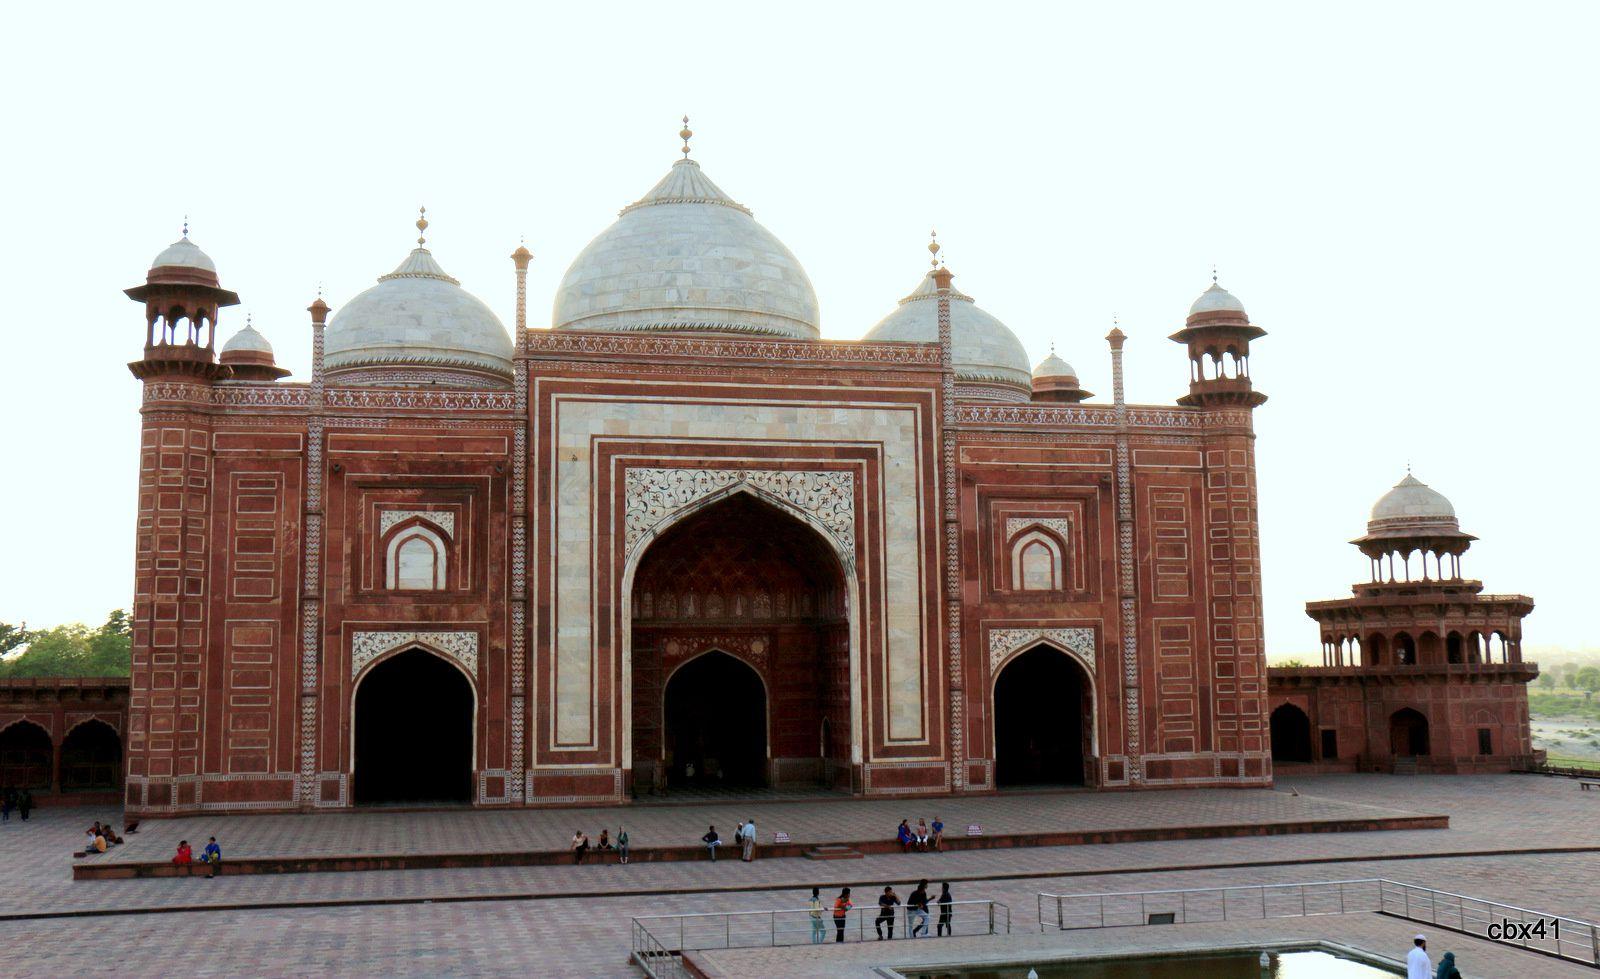 La mosquée de l'enceinte du Taj Mahal, Agra (Uttar Pradesh, Inde)